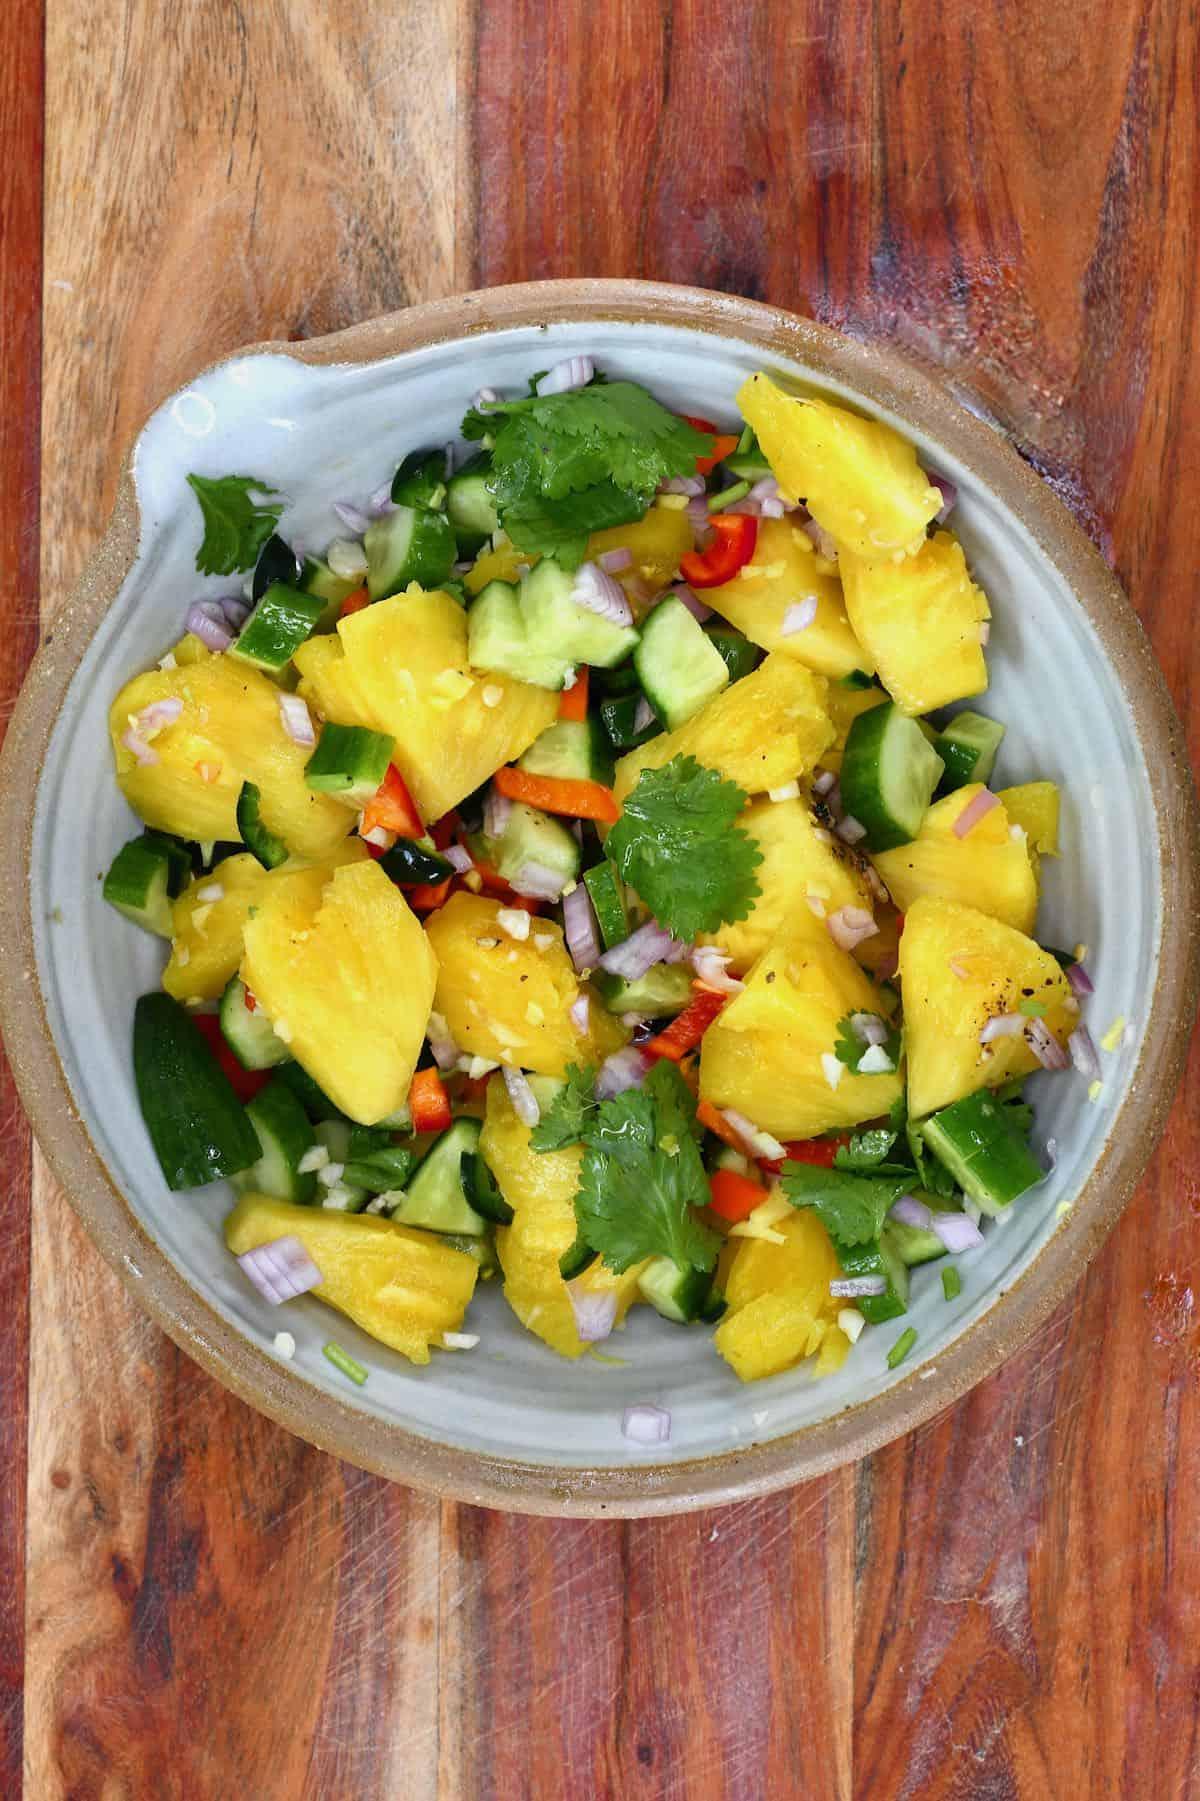 Mixed pineapple salad